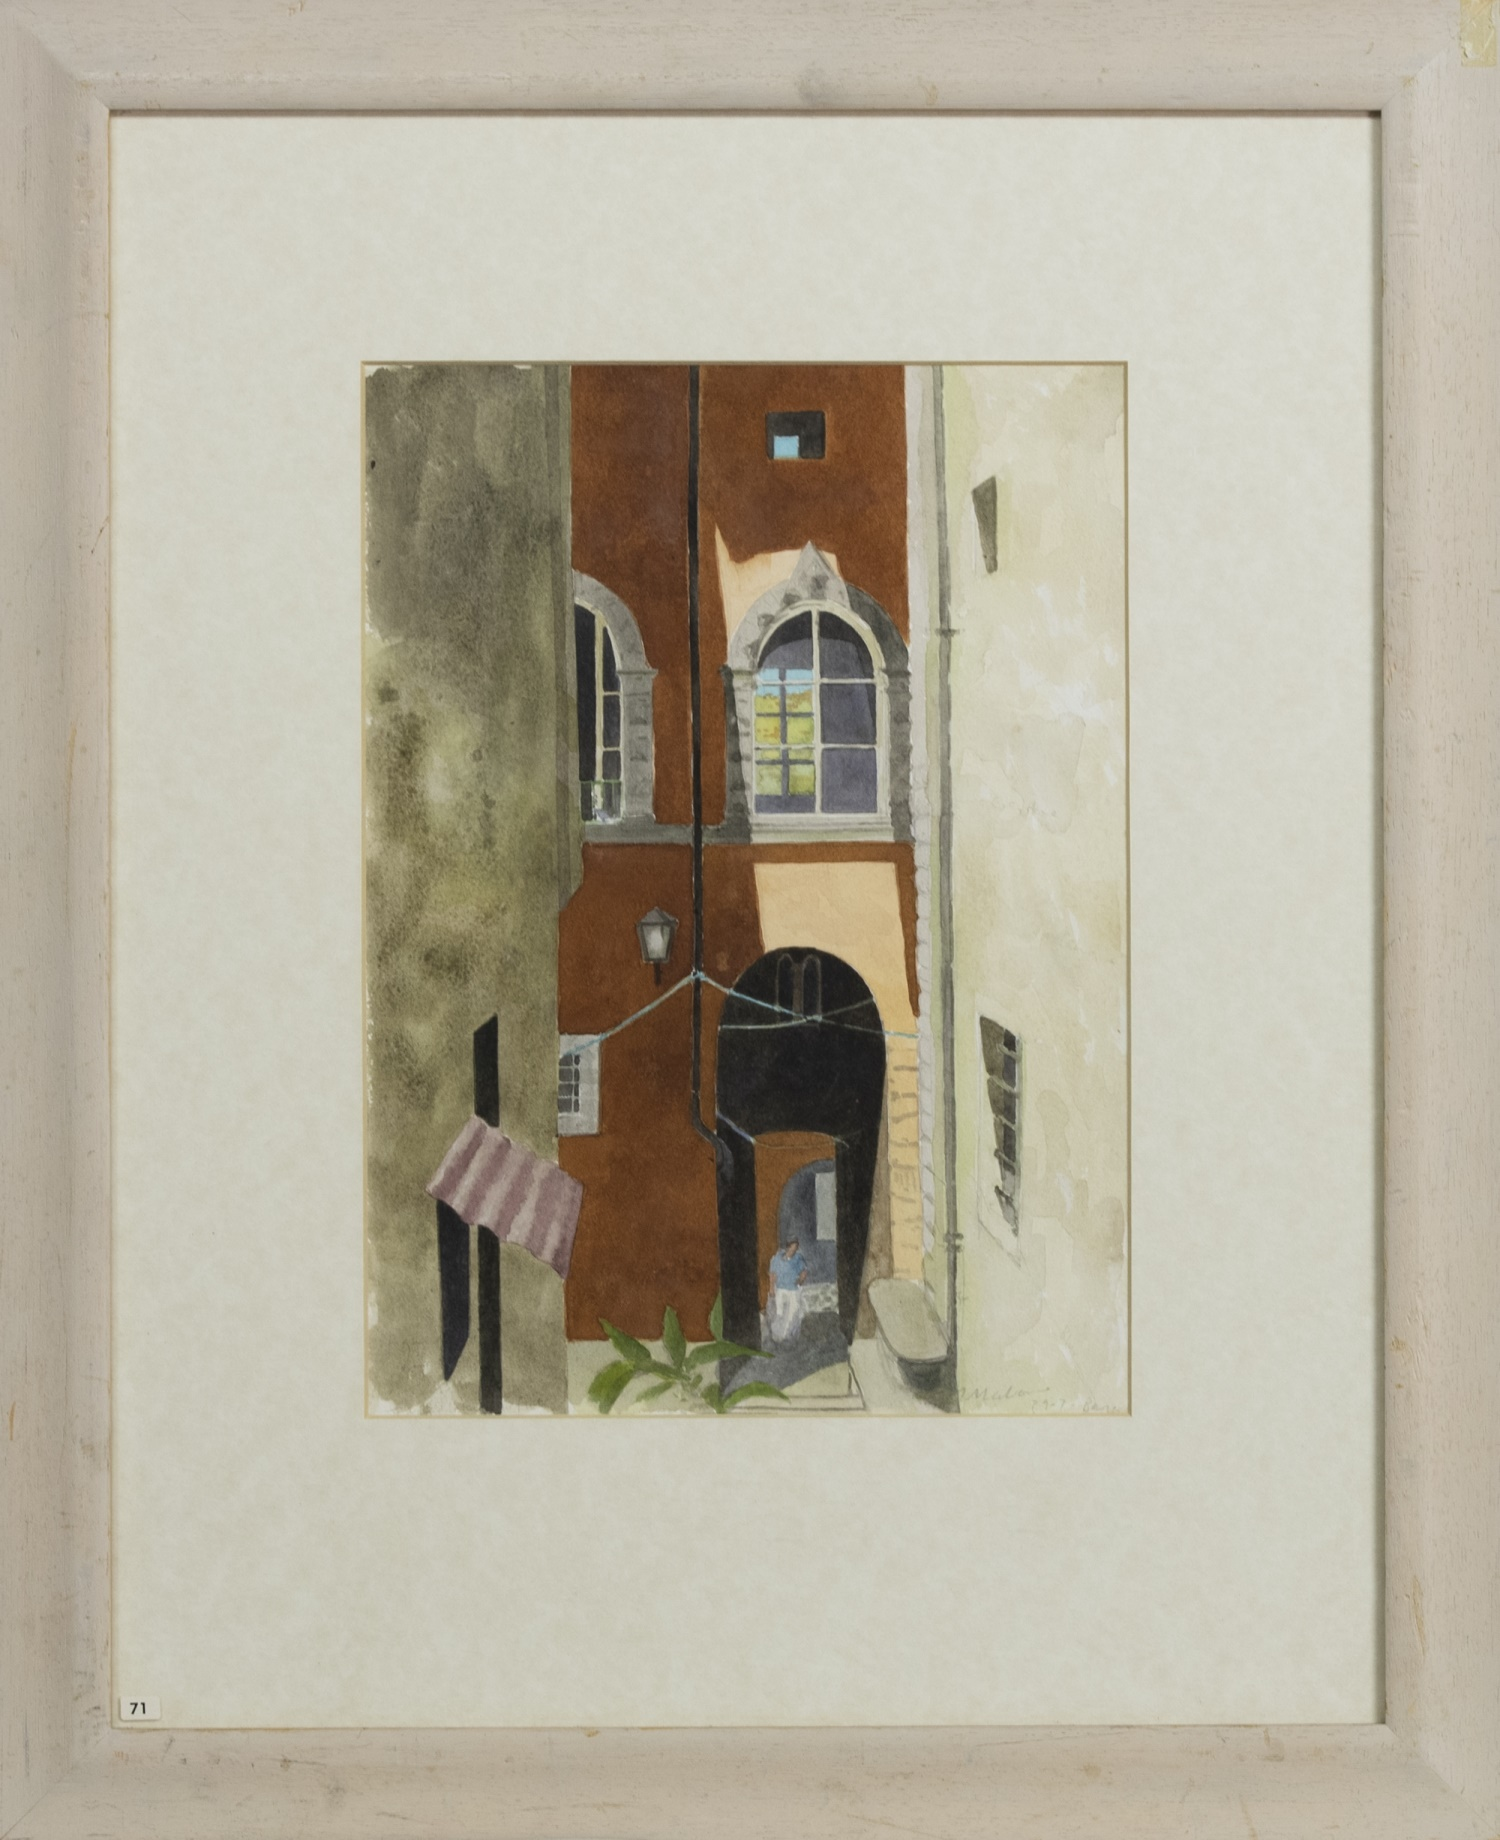 BARGA, A WATERCOLOURB BY TOM MABON